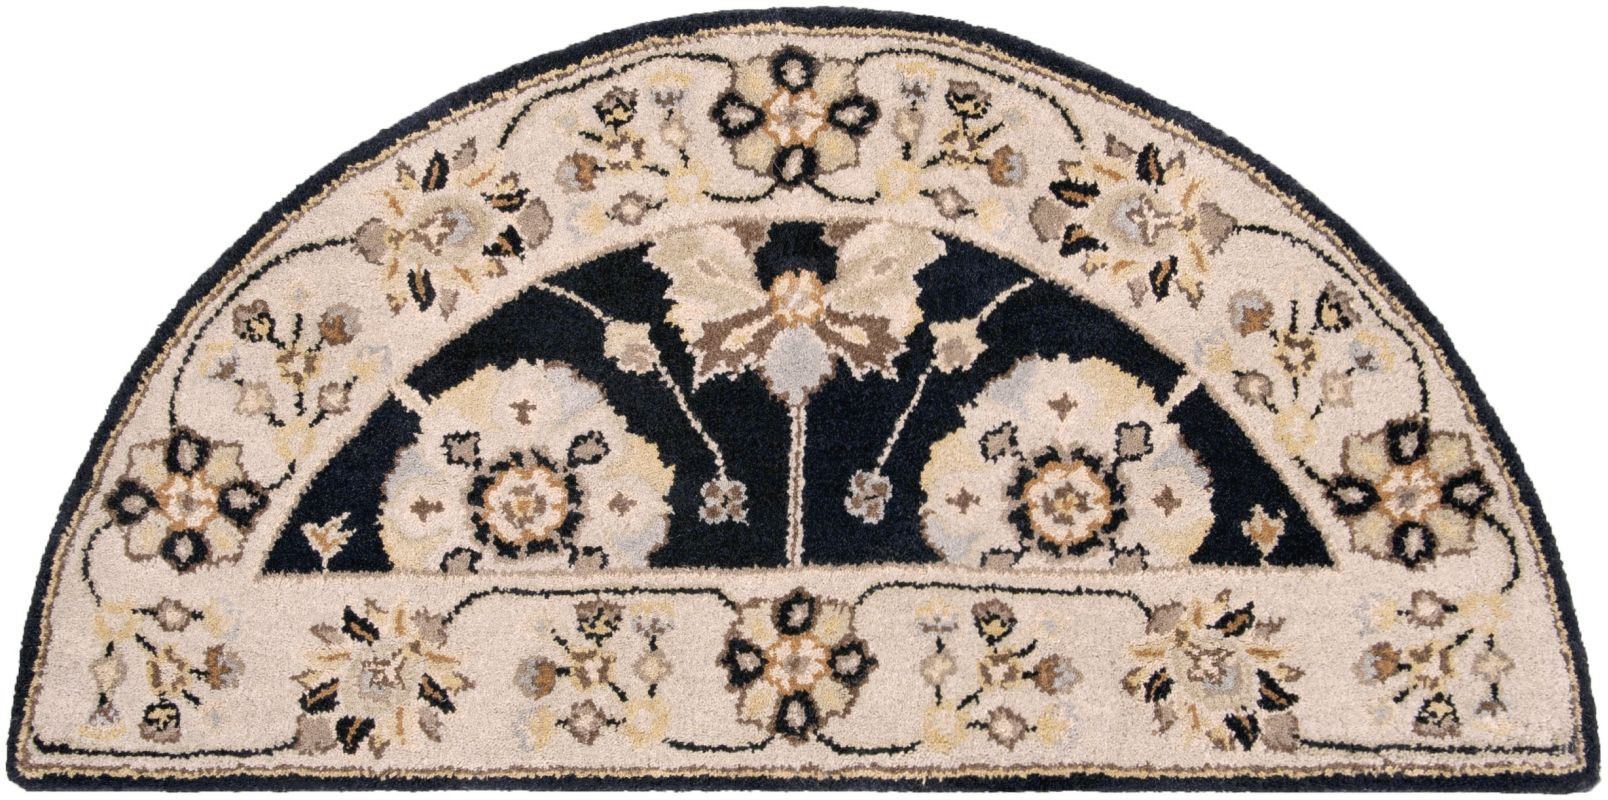 Surya CAE-1033 Caesar Hand Tufted Wool Rug Gray 2 x 4 Hearth Home